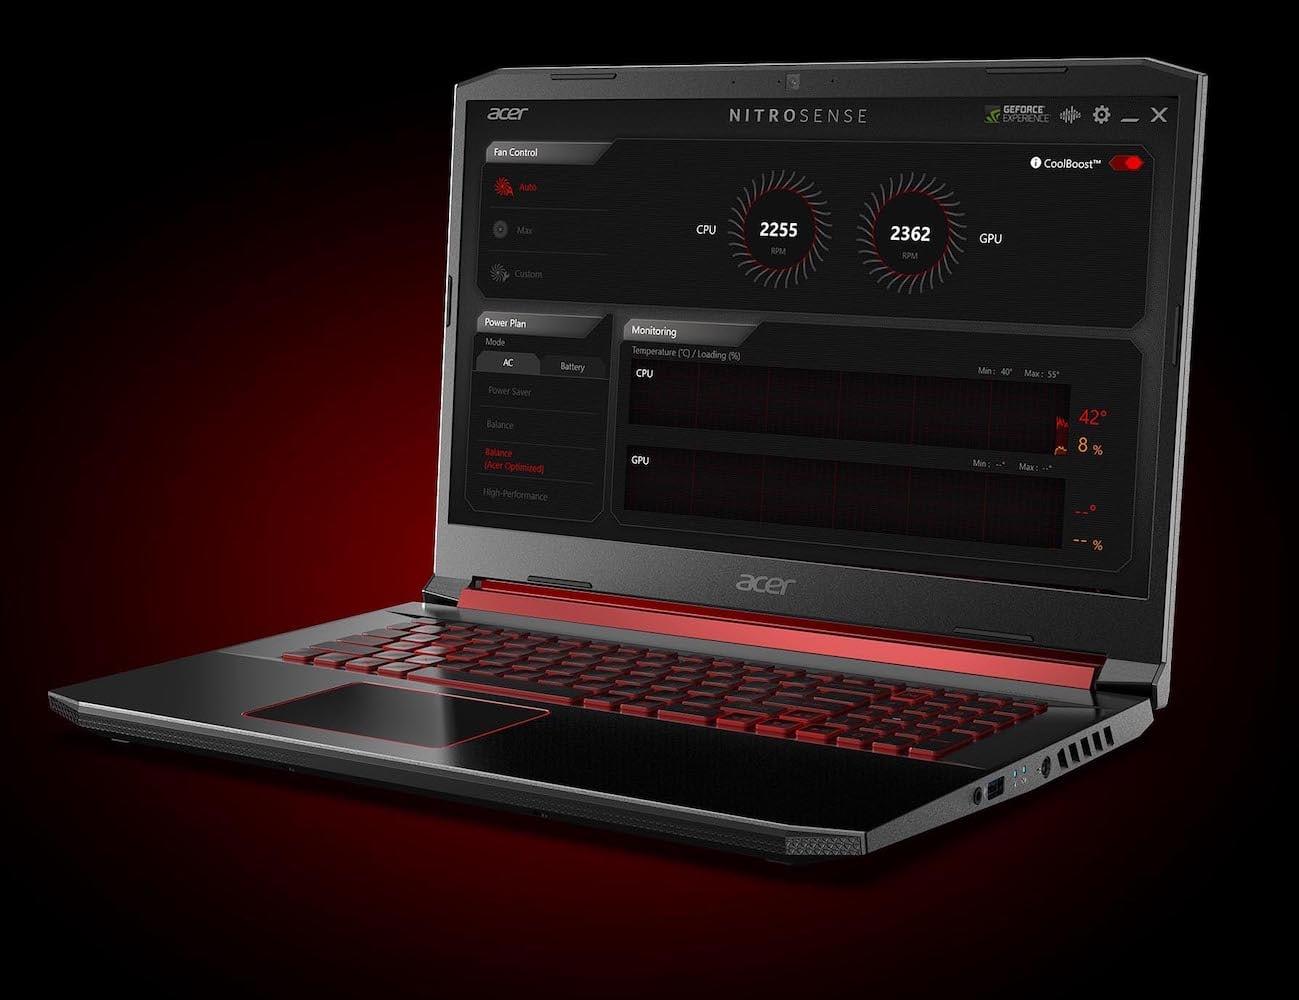 8 Gaming laptops worthy of taking you to the next level - Acer Nitro 5 01